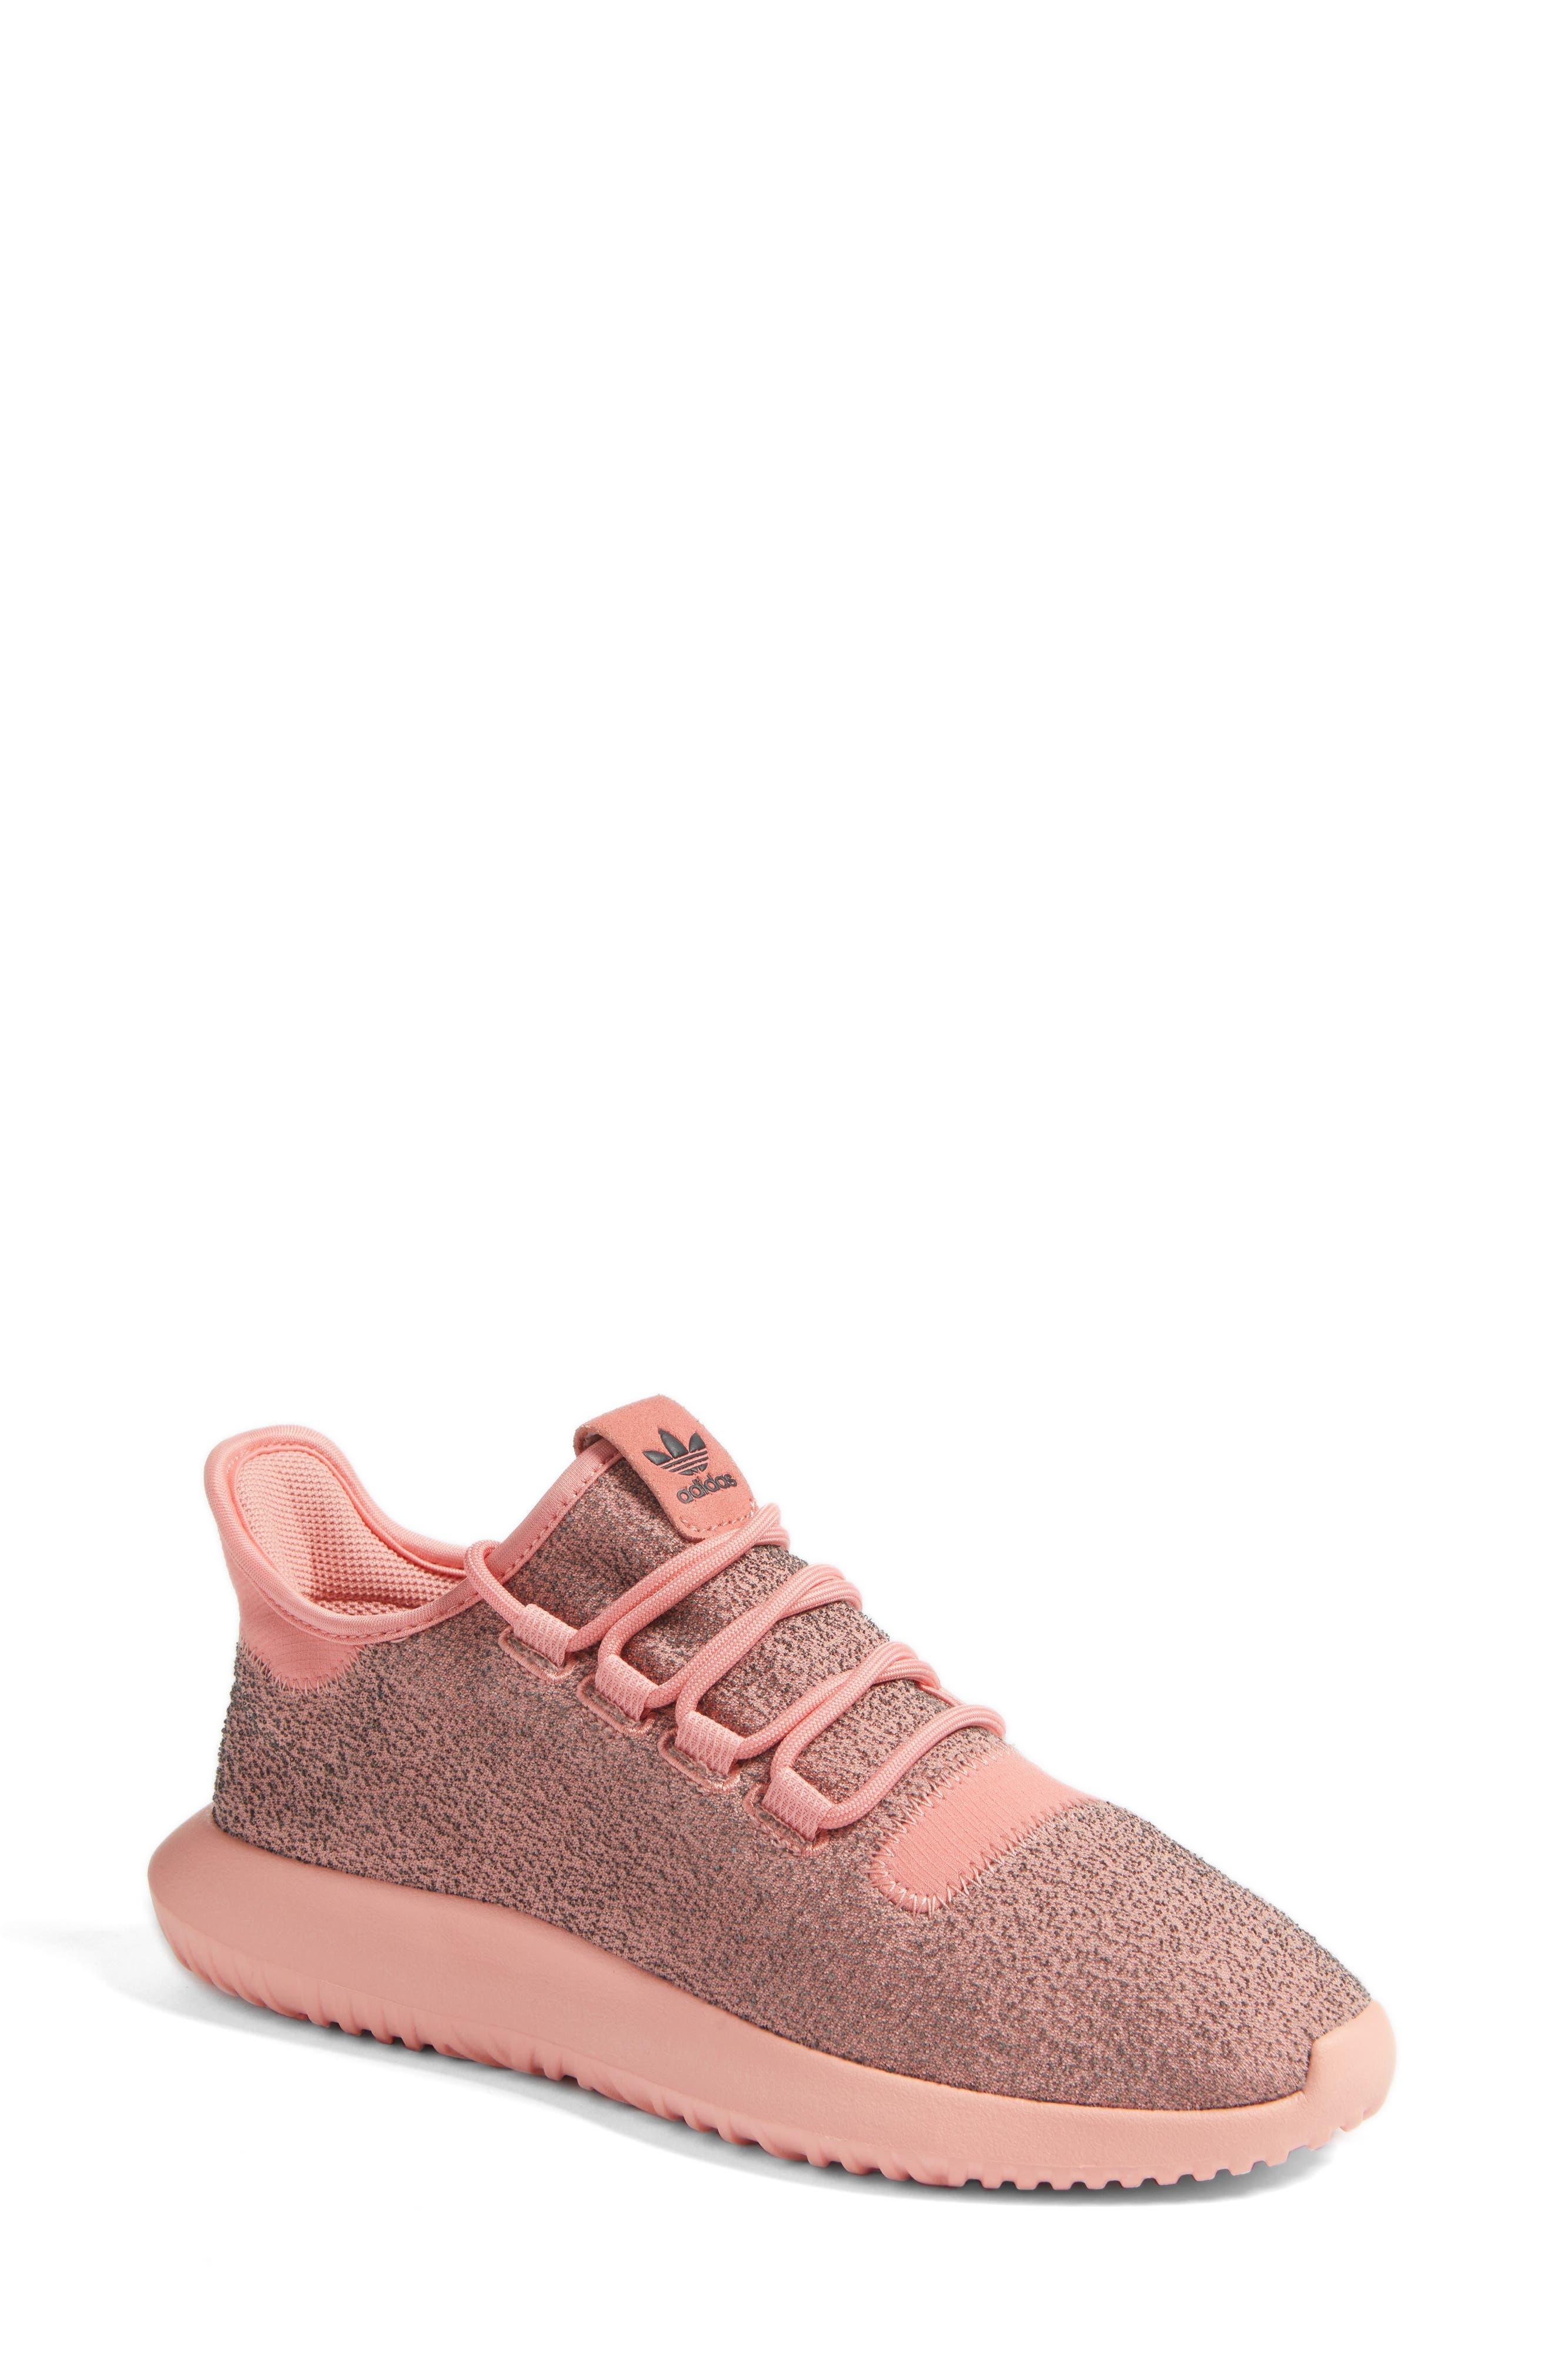 Tubular Shadow Sneaker,                         Main,                         color, Raw Pink/ Raw Pink